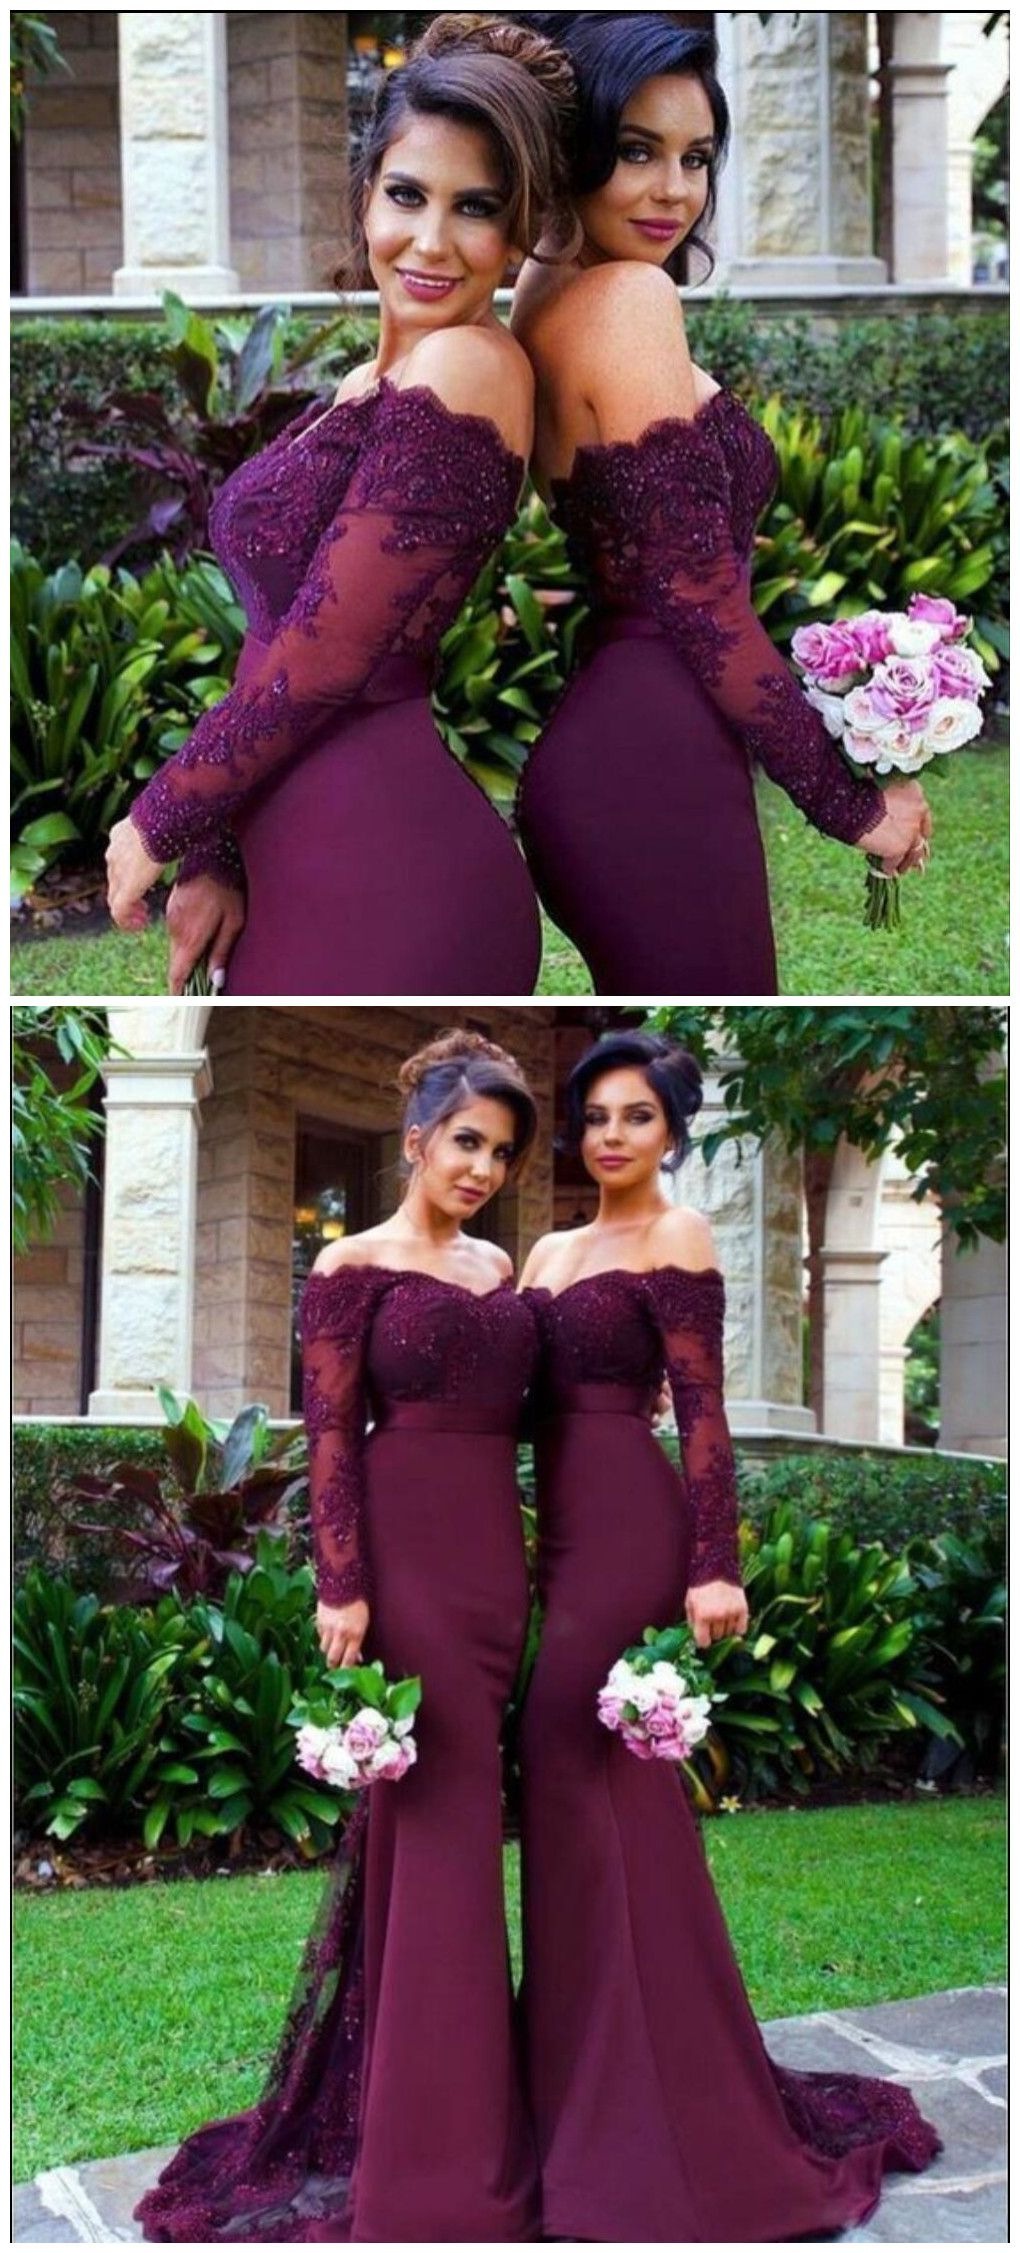 Long sleeve lace prom dress, Purple Mermaid prom dresses